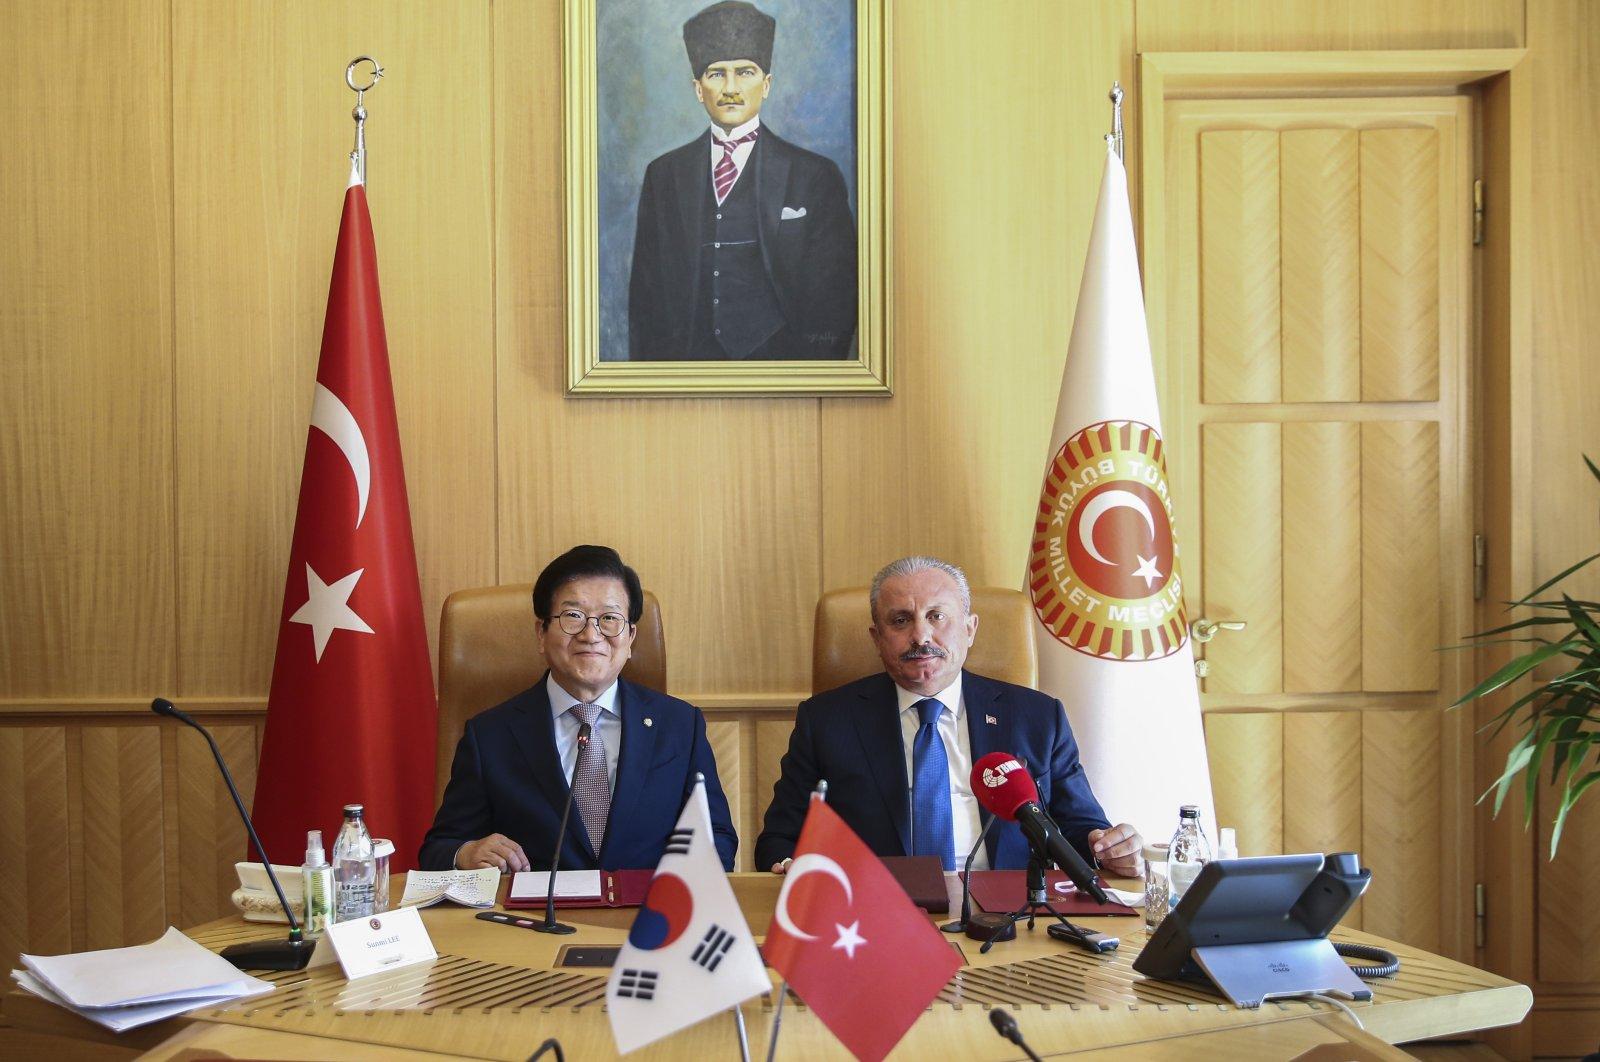 Turkey's Parliament Speaker Mustafa Şentop (R) receives South Korean ParliamentSpeaker Park Byeong-seug in the parliament in the capital Ankara, Turkey, Aug. 17, 2021. (AA Photo)